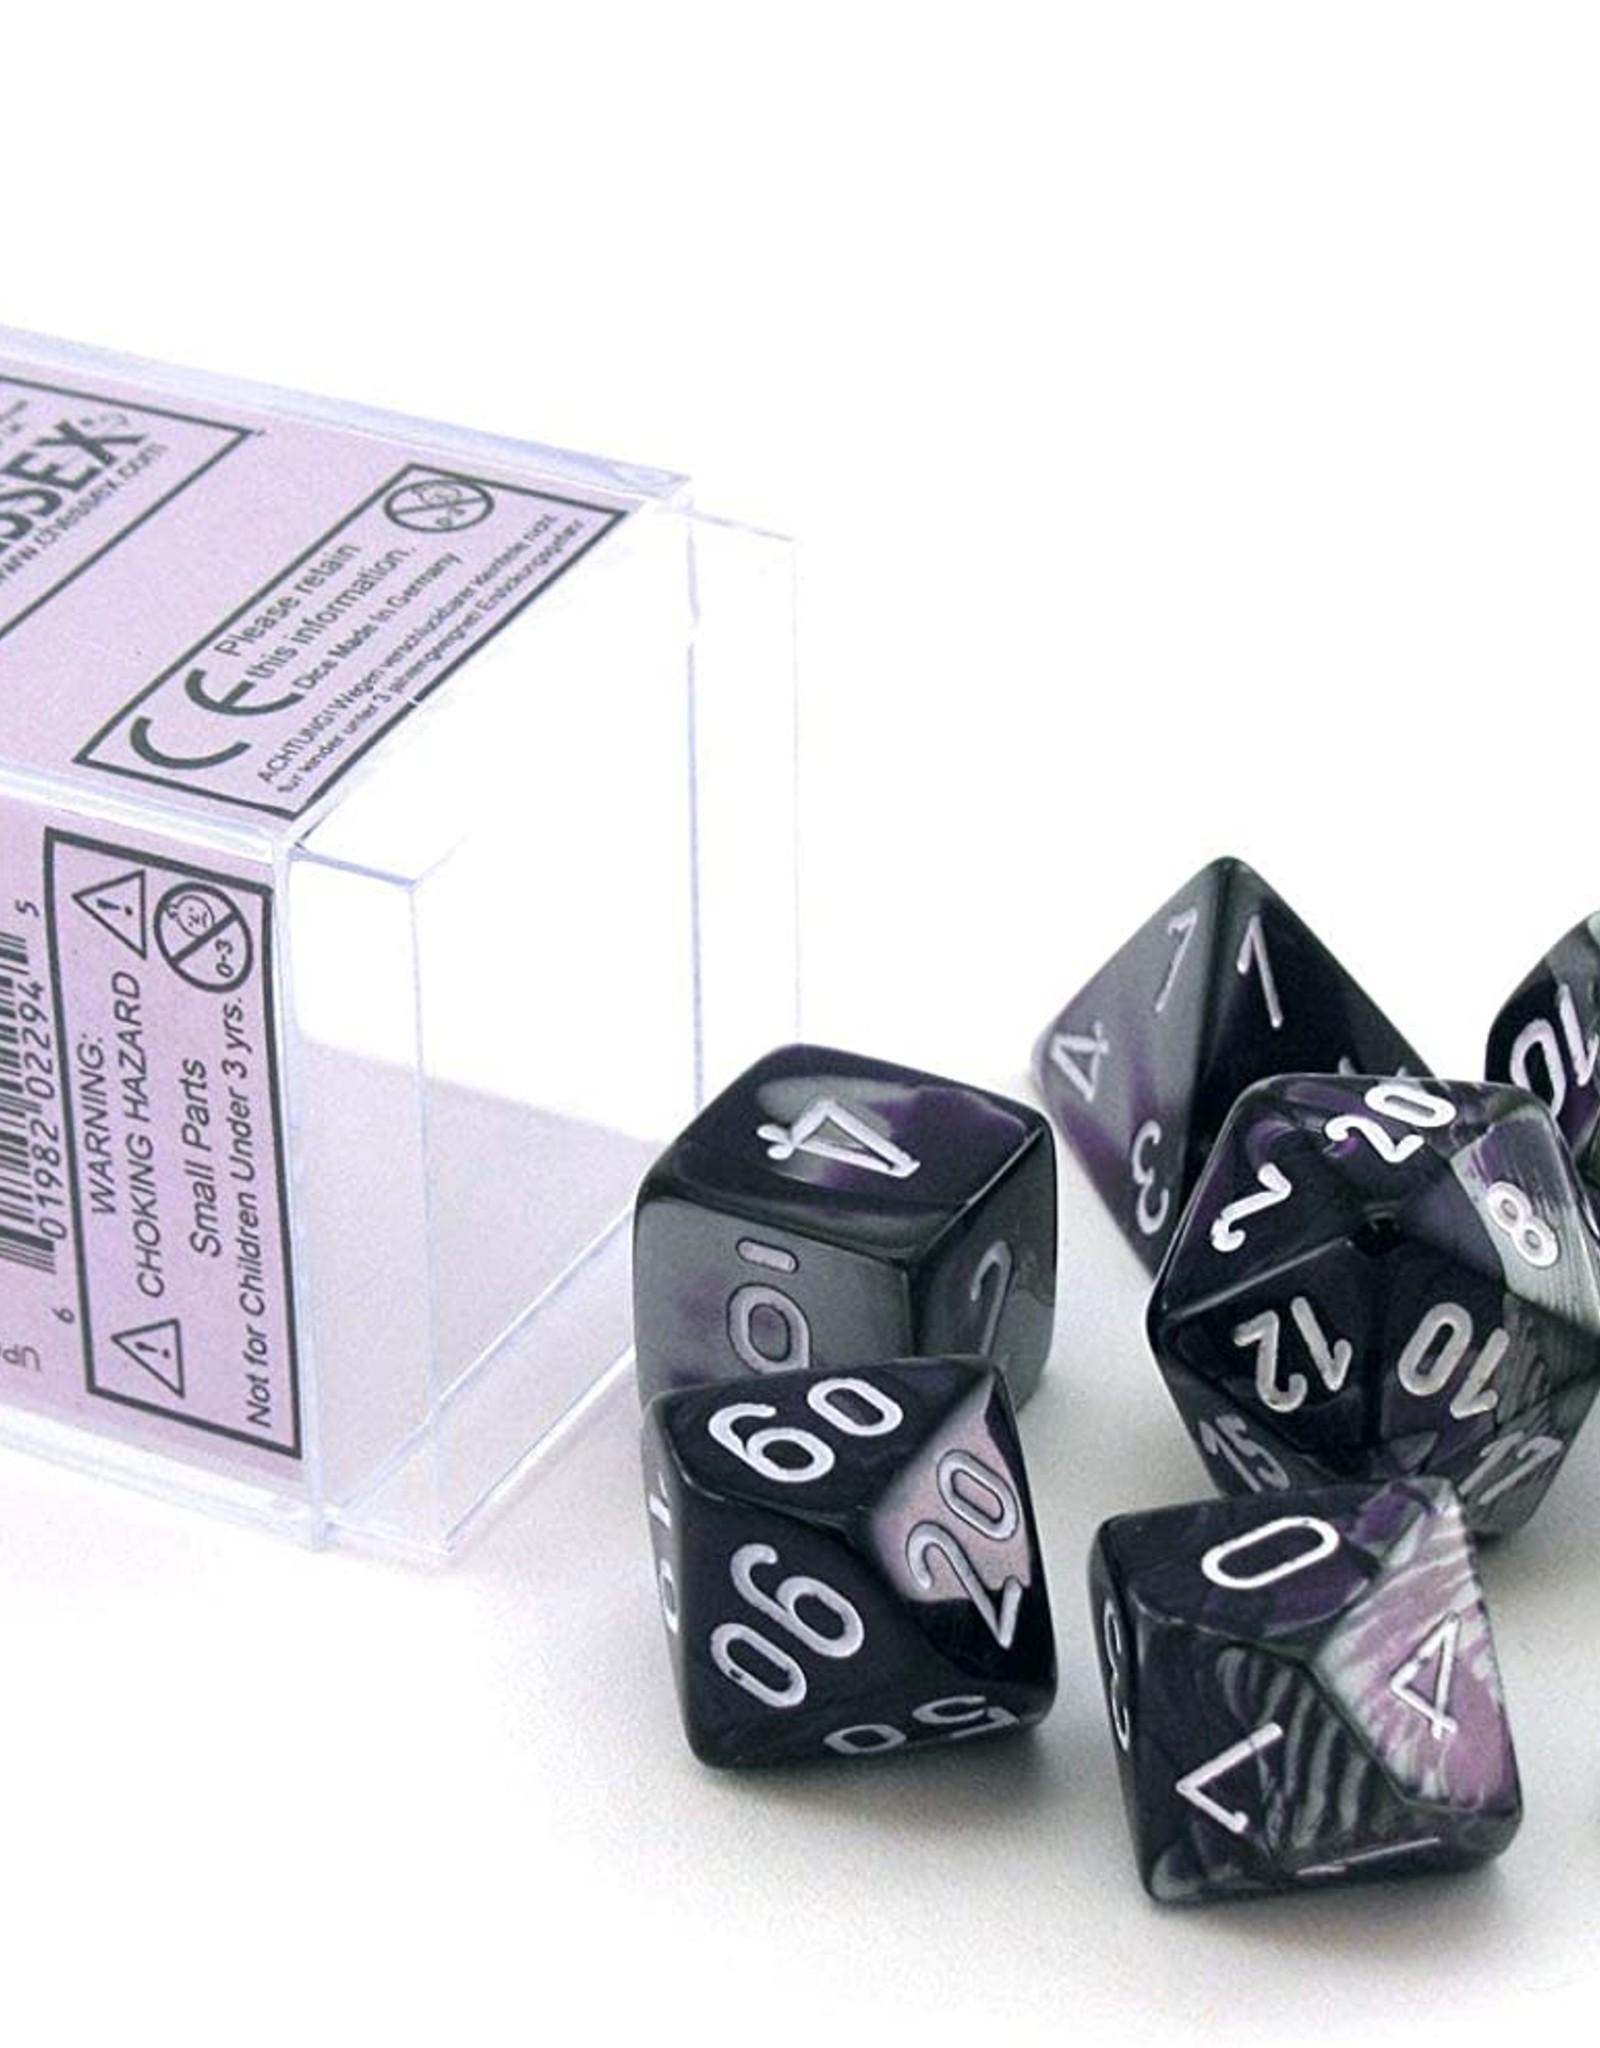 Chessex Gemini Poly 7 set: Purple & Steel w/ White